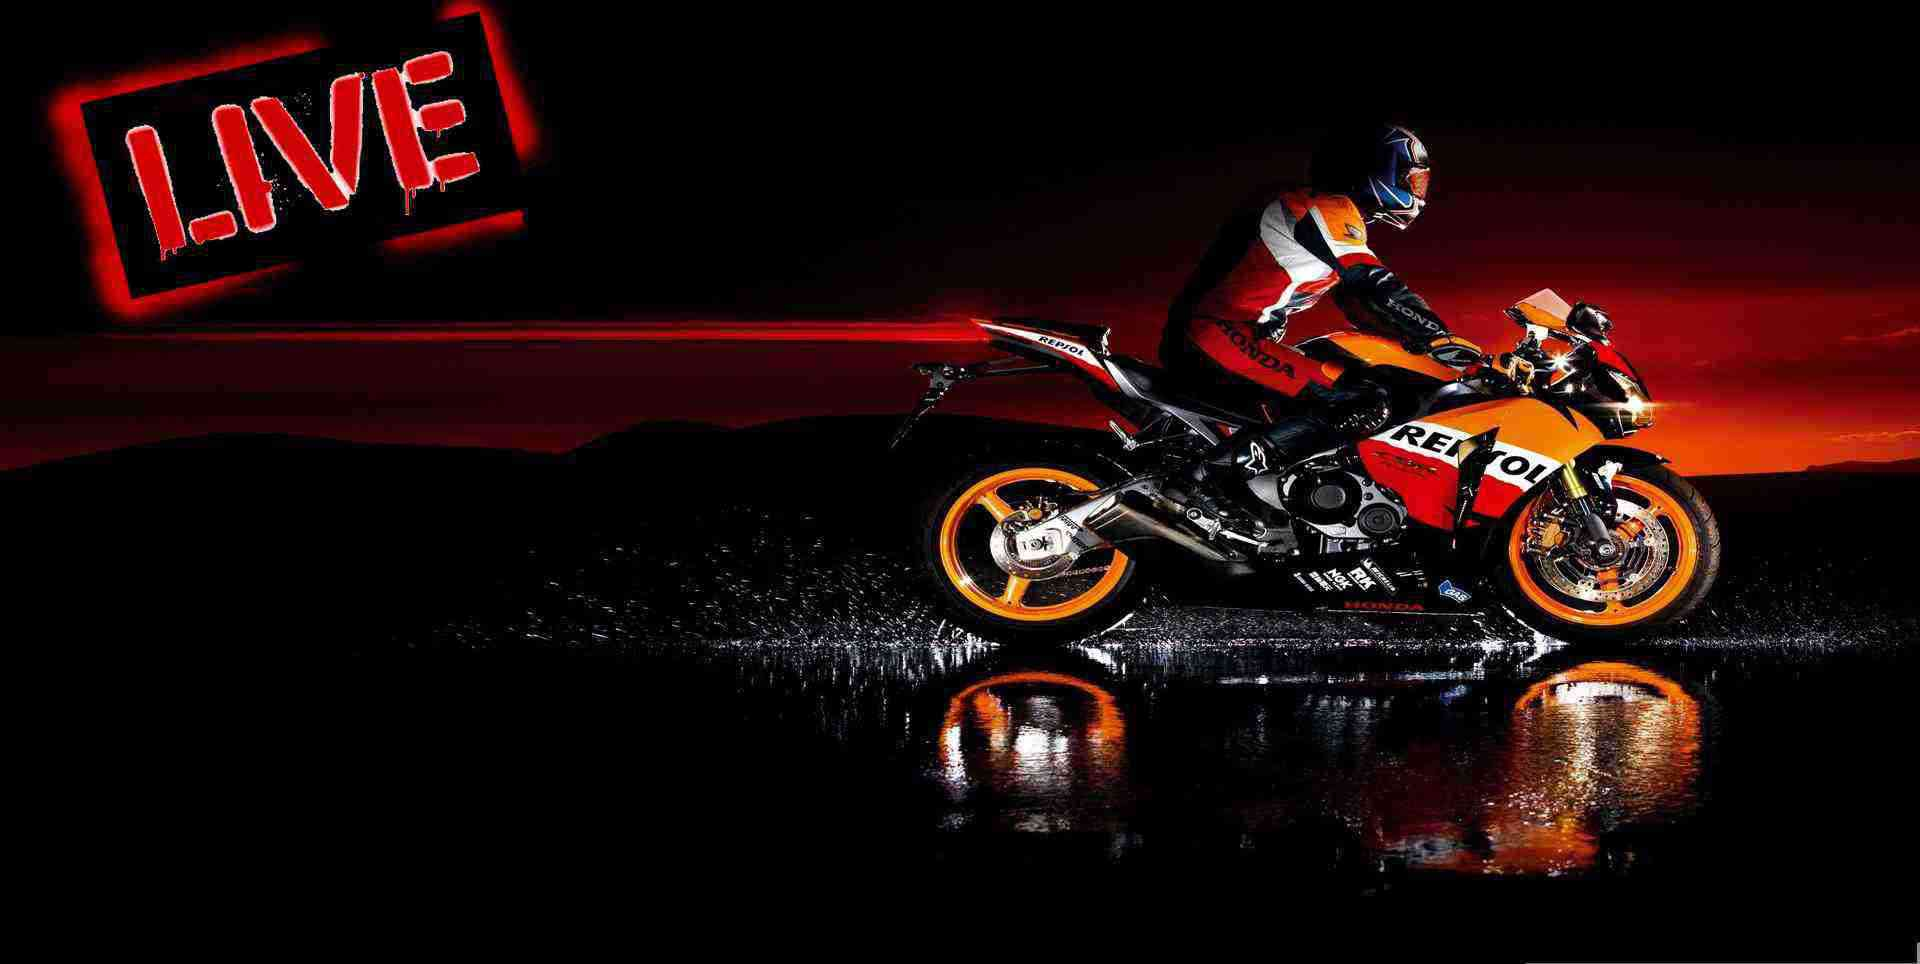 Live 2014 American MotoGP Grand Prix Online